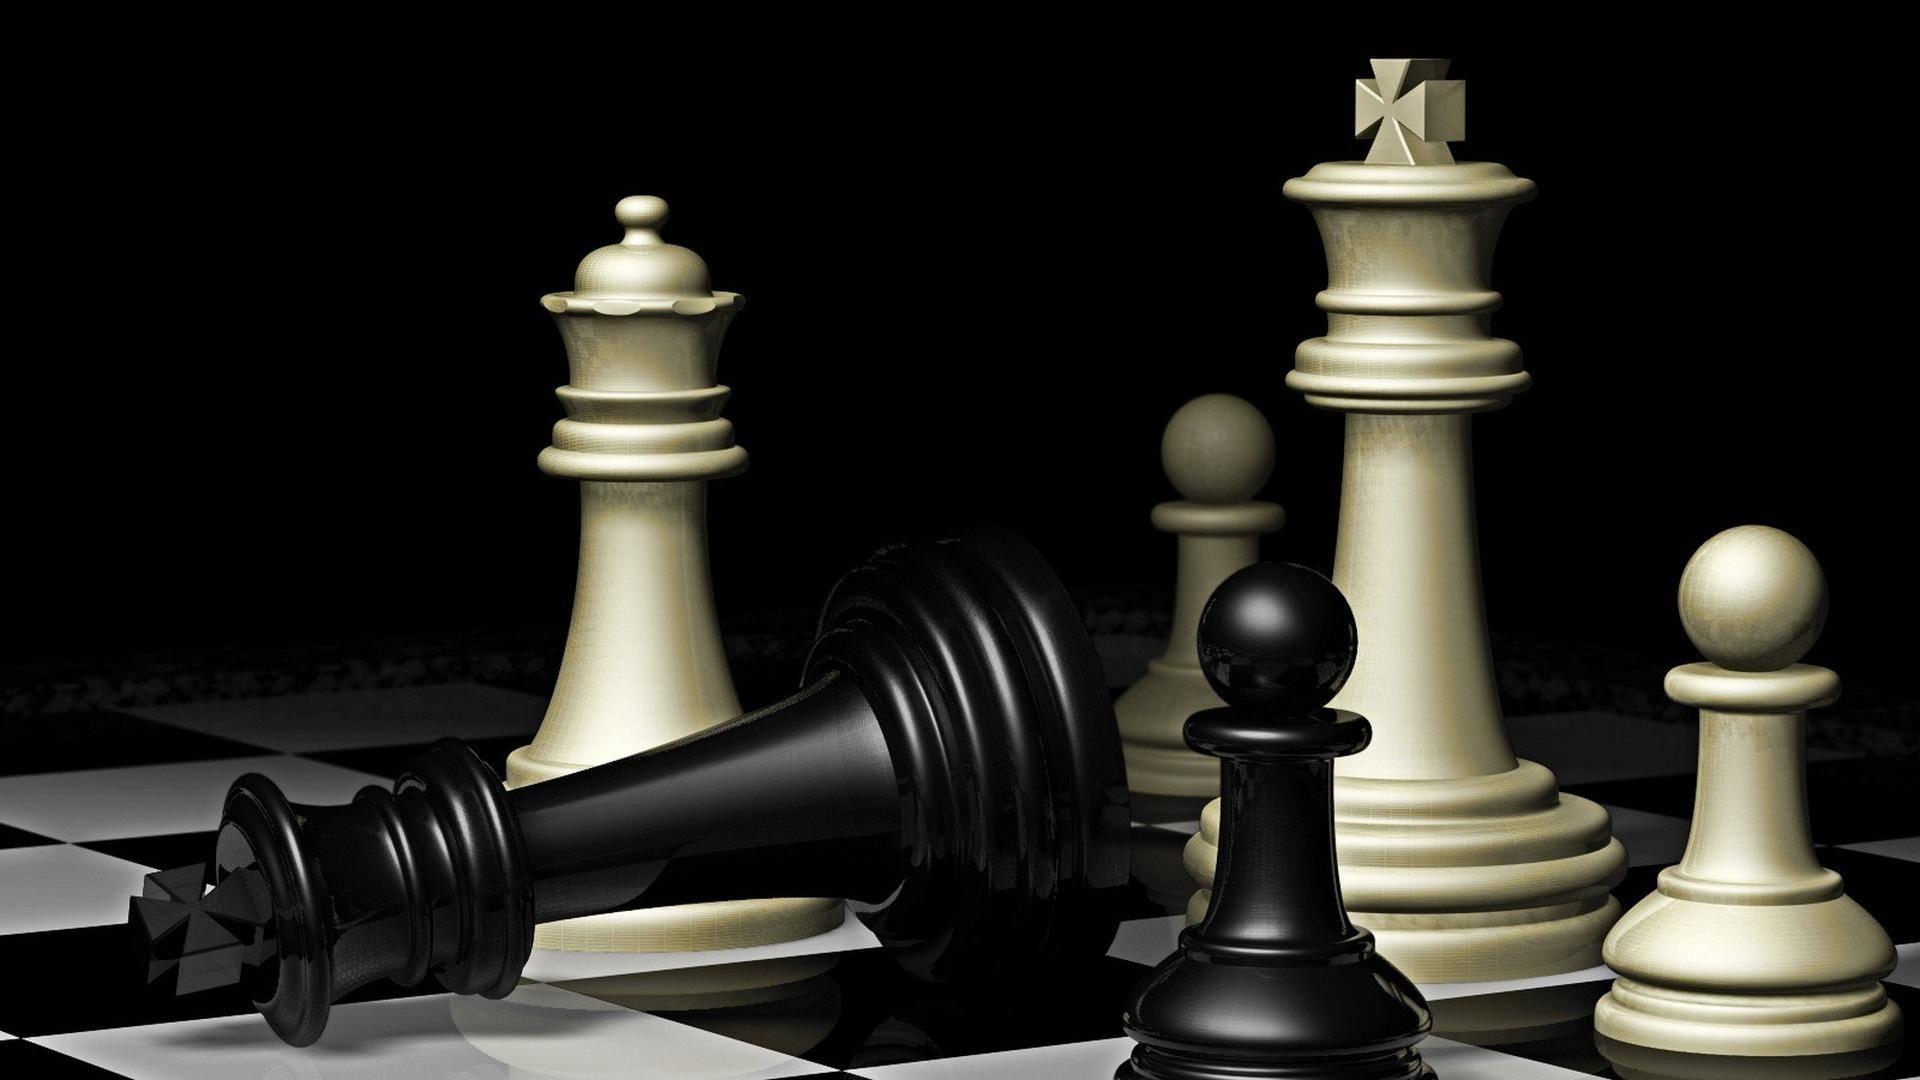 Chess King Wallpaper Photo Yay Chess Chess Wallpaper Wooden